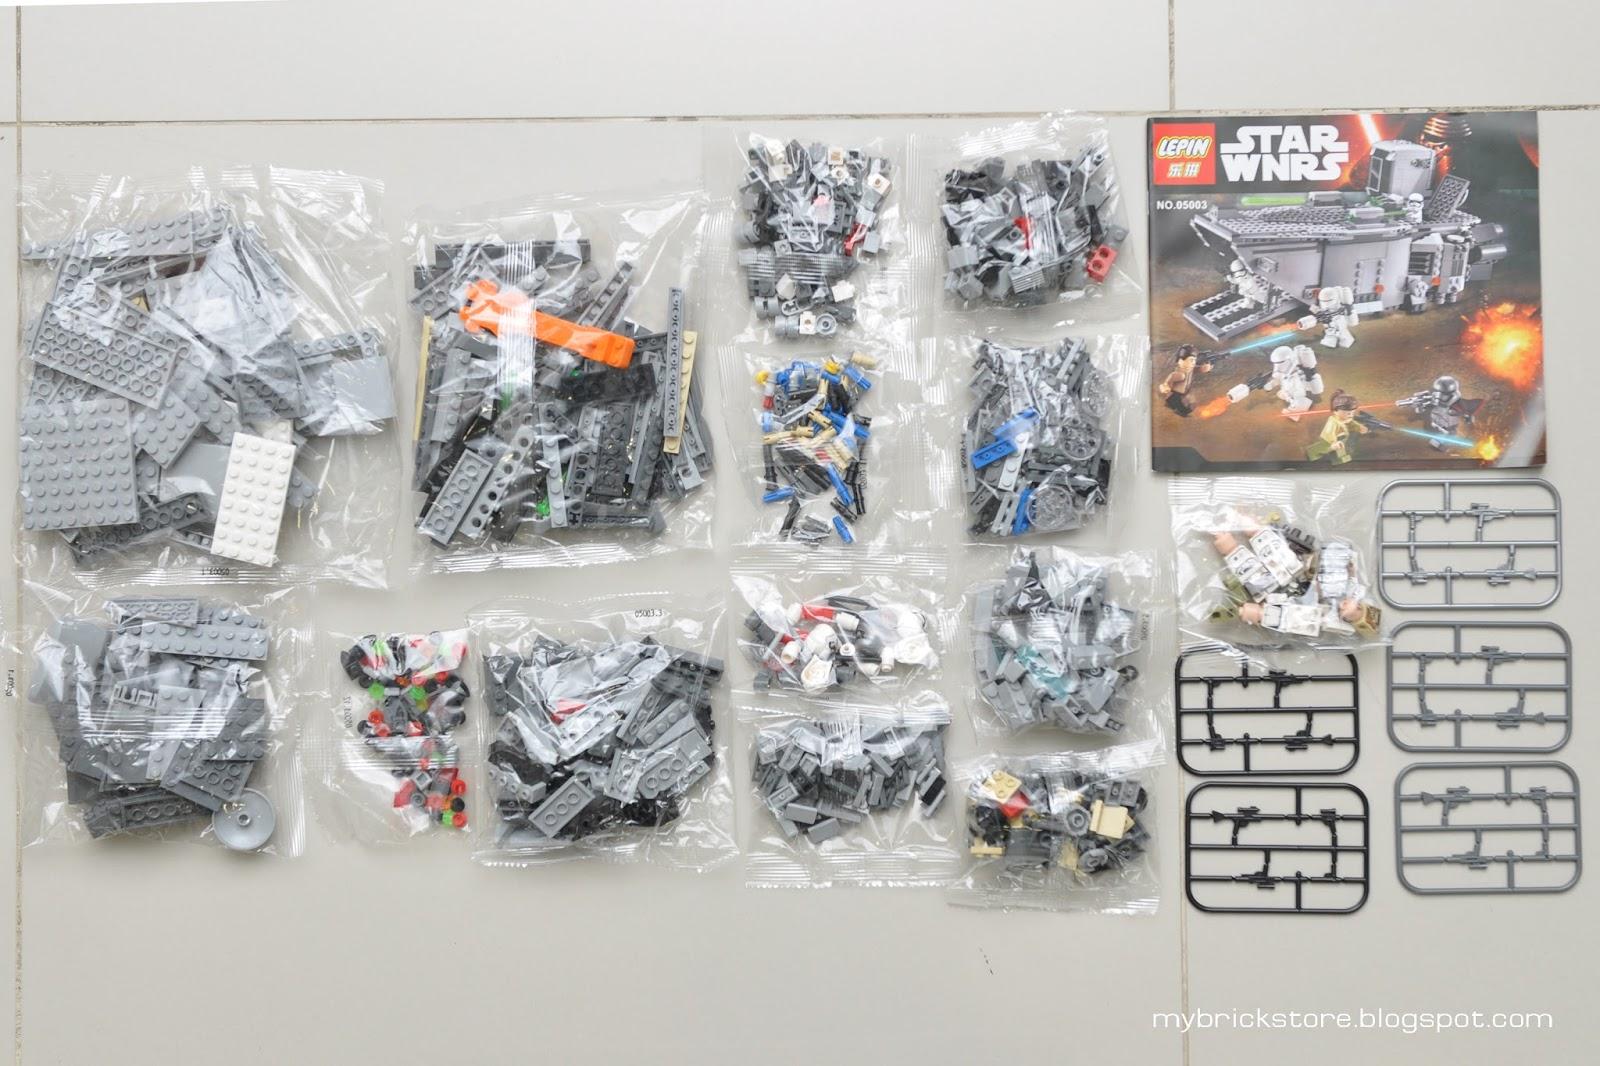 LEGO Star Wars Millenium Falcon 75105 ToysRUs